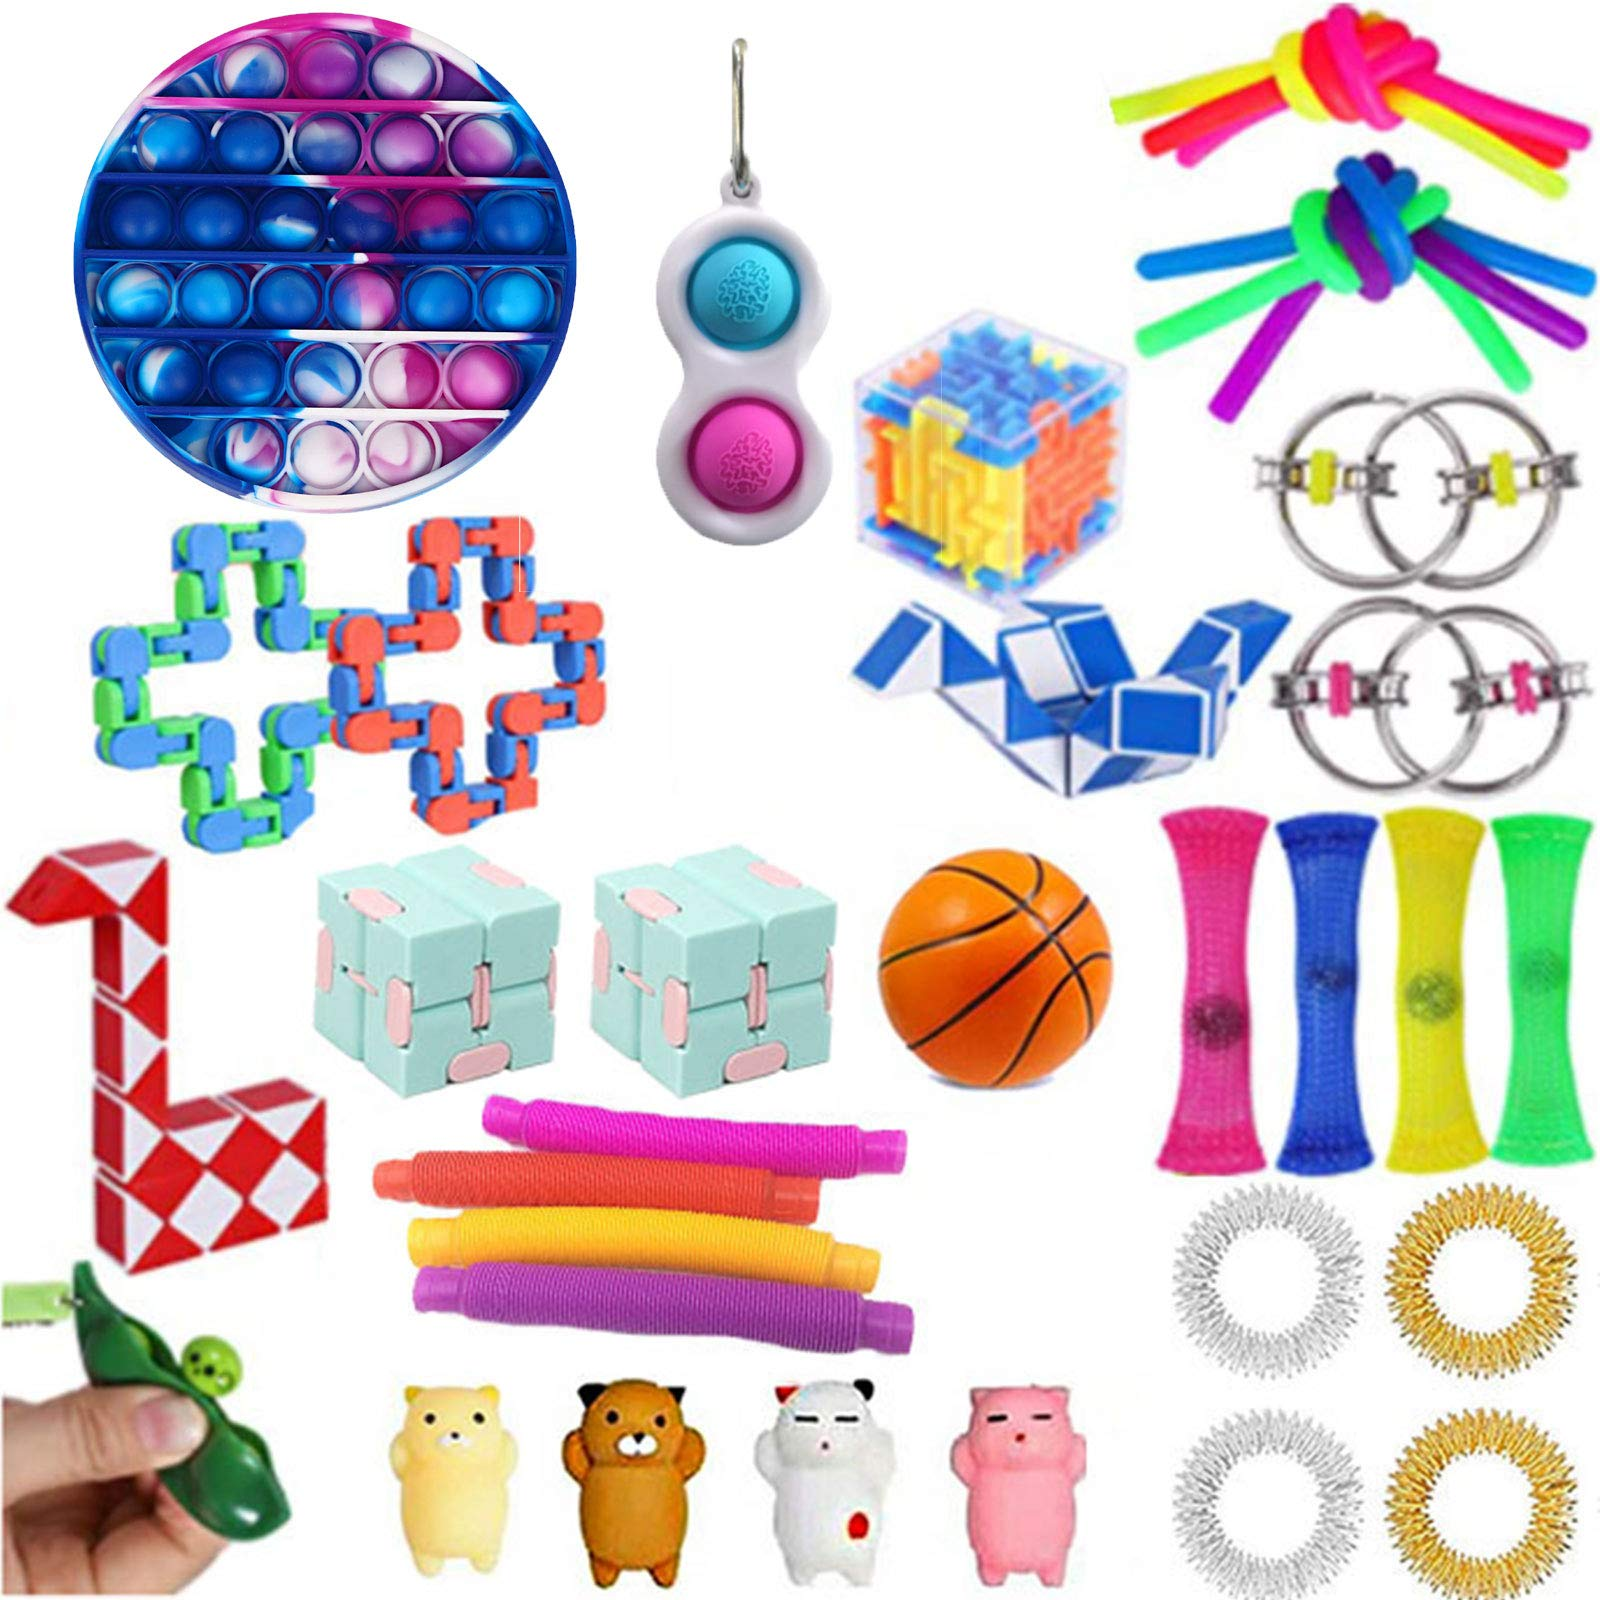 Komoo Fidget Toy 31Pcs Packs Cheap, Simple Dimple Fidget Toys Fidgets Box, Decompression Keychain Toy, Push Pop Bubble Sensory Toy for Kids and Adults (D)